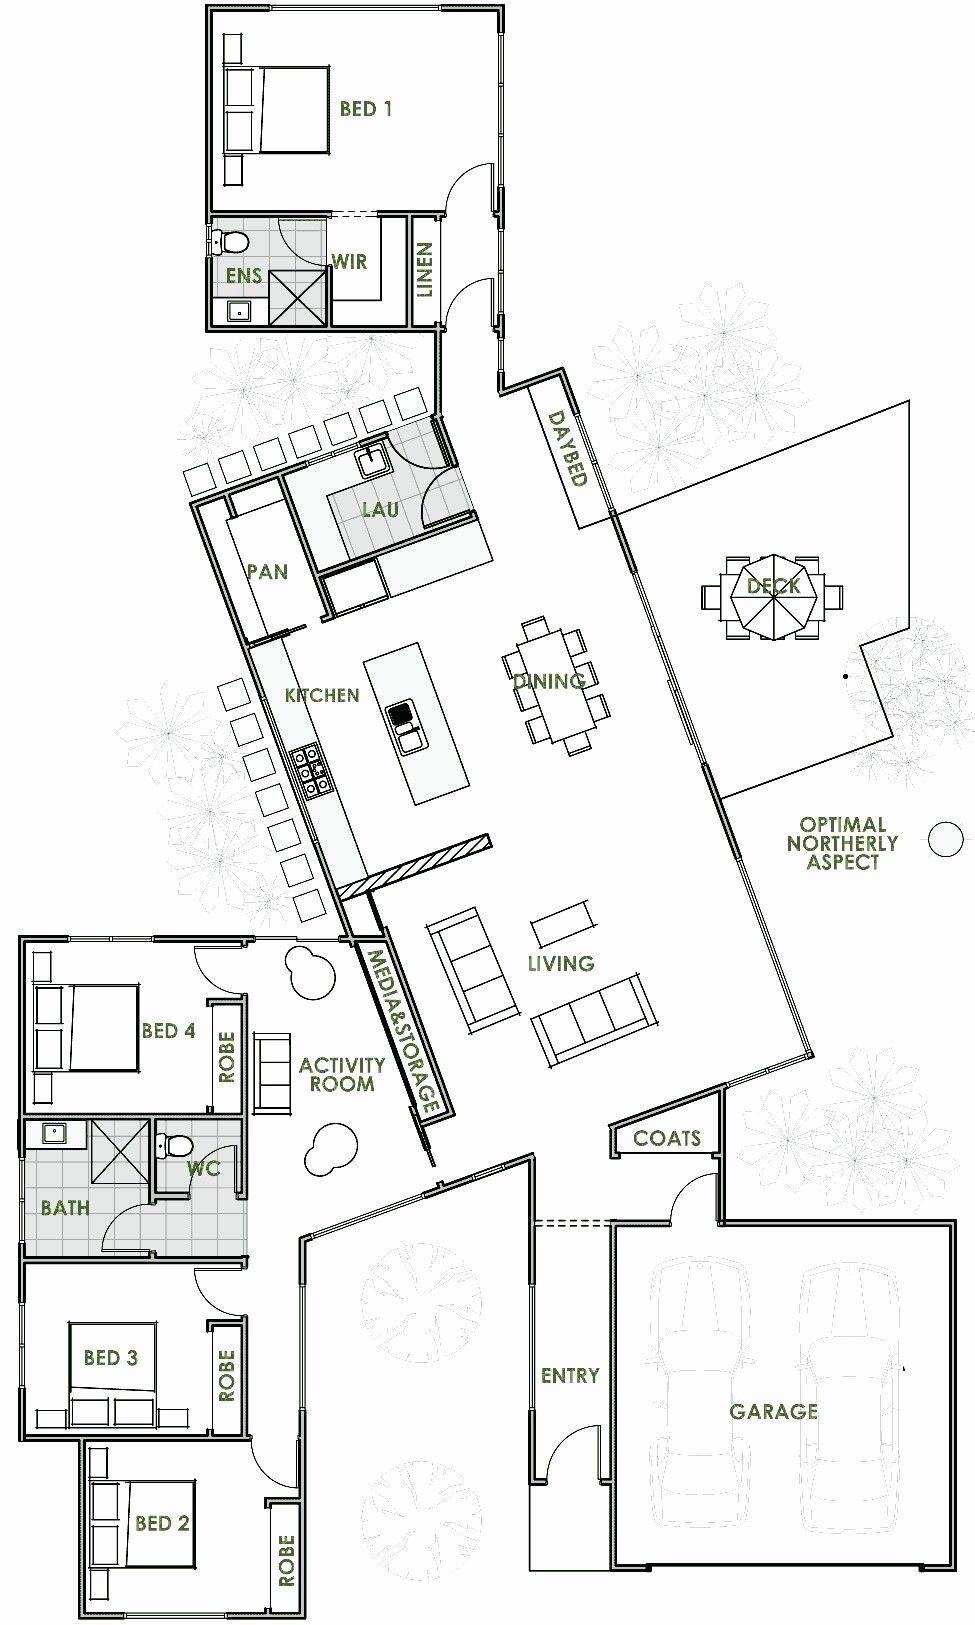 Green House Plans Designs Fresh Now That S Different In 2020 Energy Efficient House Plans Green House Design Home Design Floor Plans